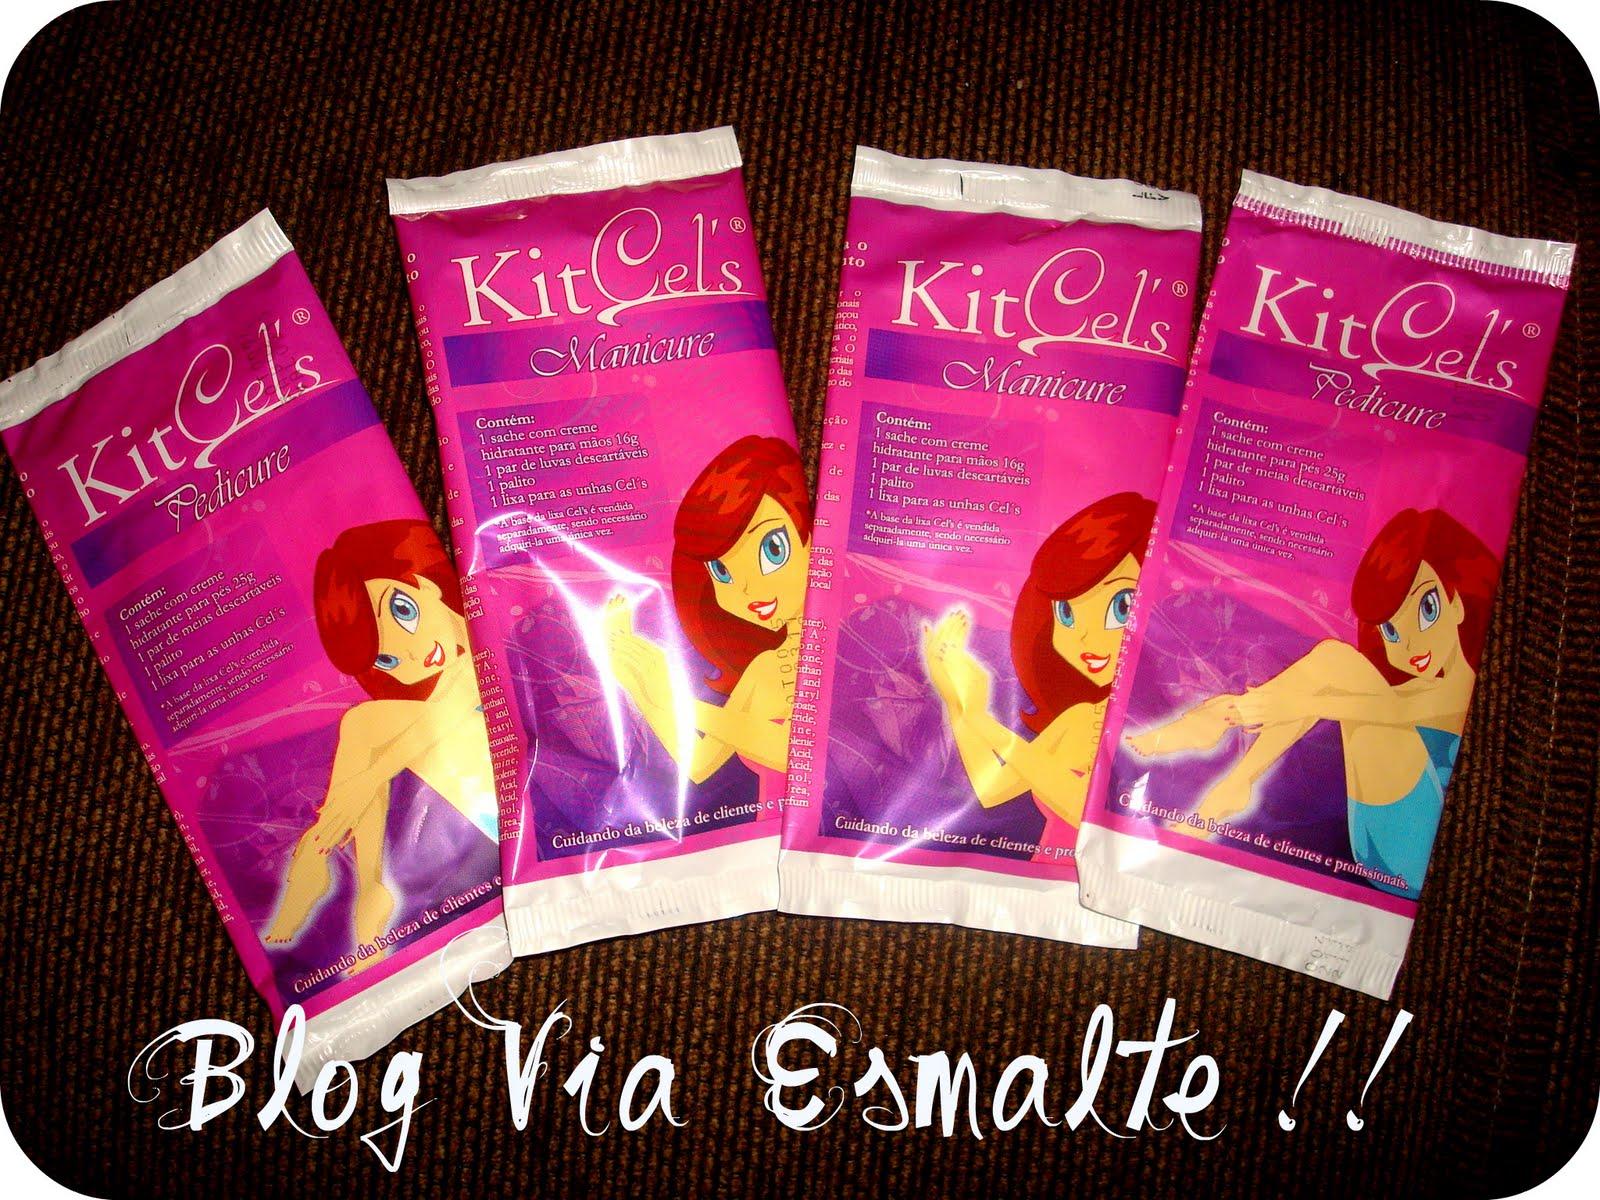 http://1.bp.blogspot.com/-k86qWupHXfc/Tgp4X-kd_HI/AAAAAAAADuA/0Nu3gcapV5E/s1600/DSC07853.JPG